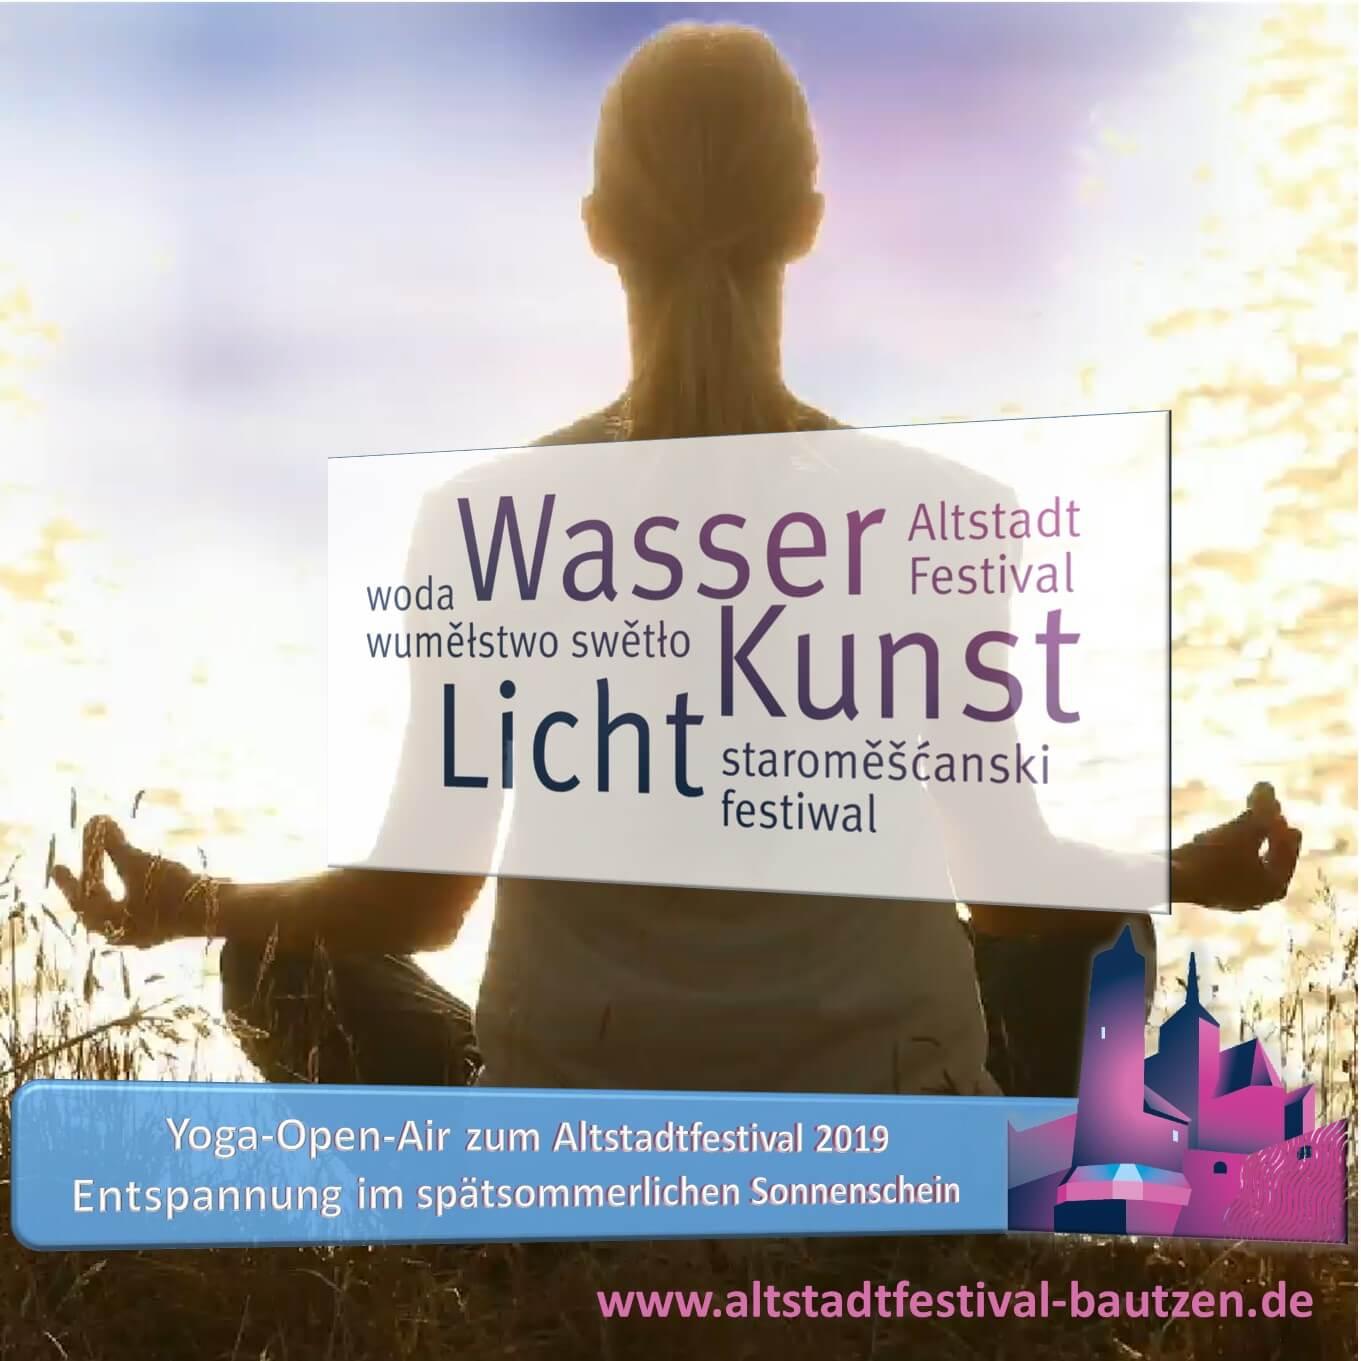 Beitrag Yoga Open Air zum Altstadtfestival 2019